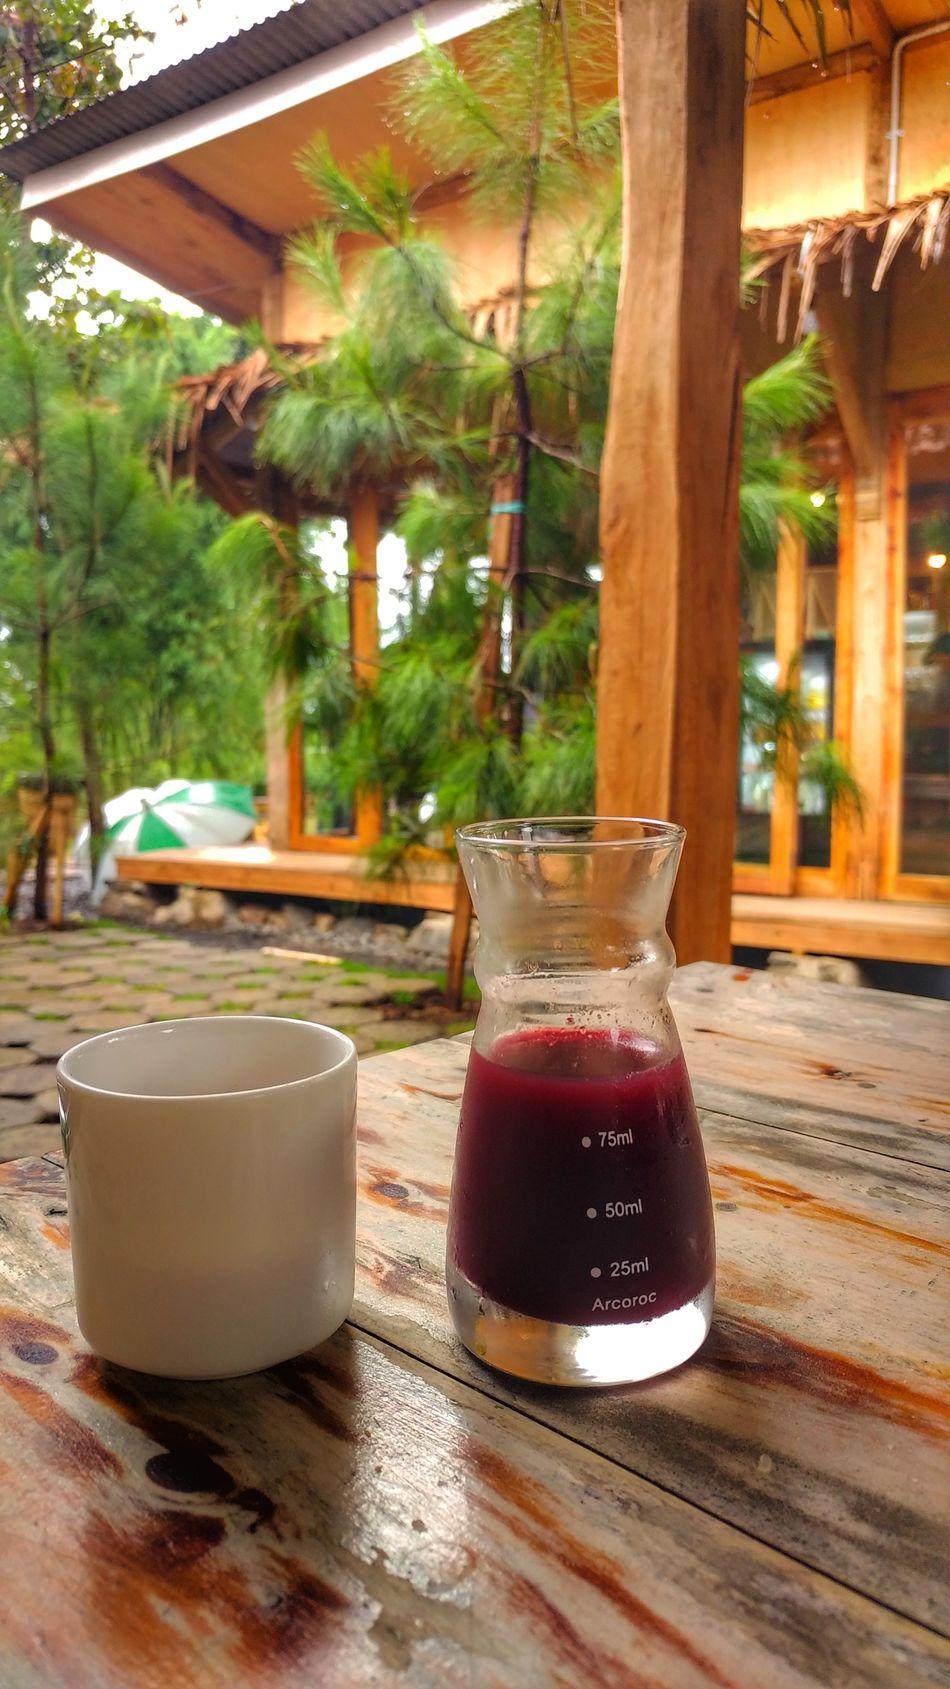 Nature Val  LG  G5se Lgg5se Tree Freshness Drink Refreshment